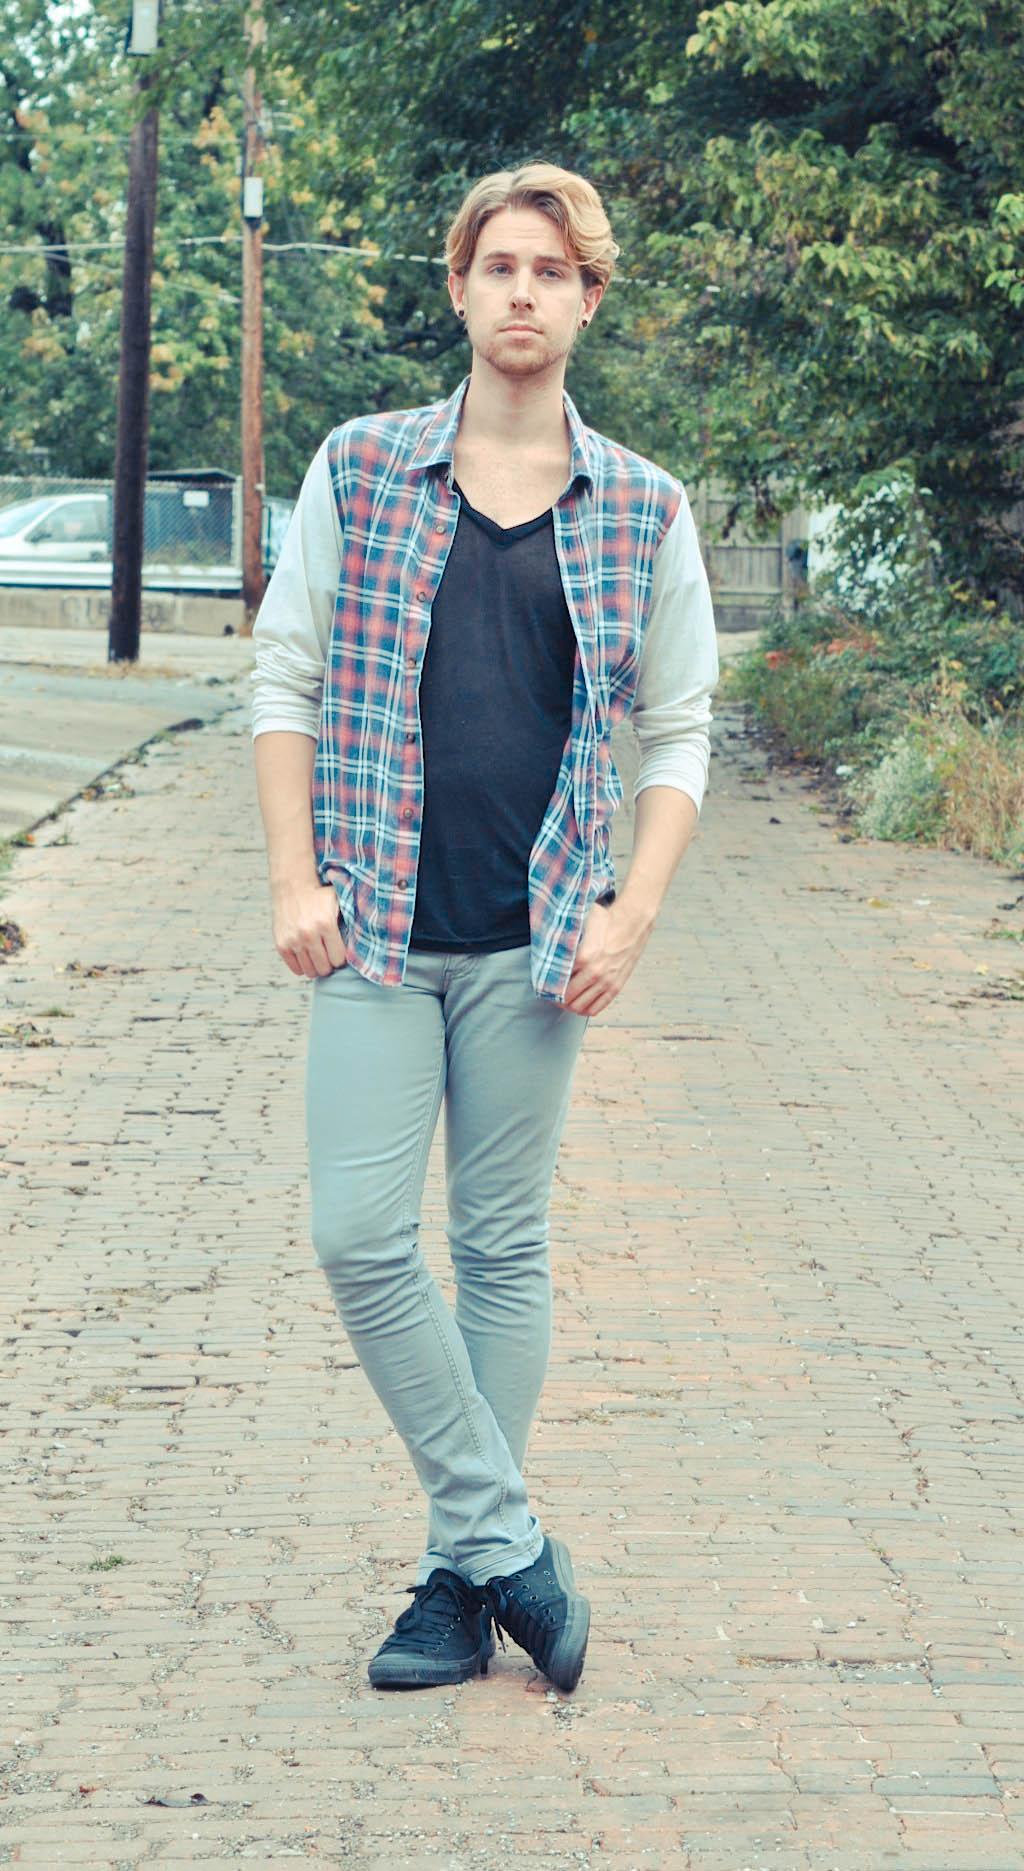 color-fast-plaid-shirt-american-apparel-v-neck-t-shirt-levis-jeans-converse-chucks